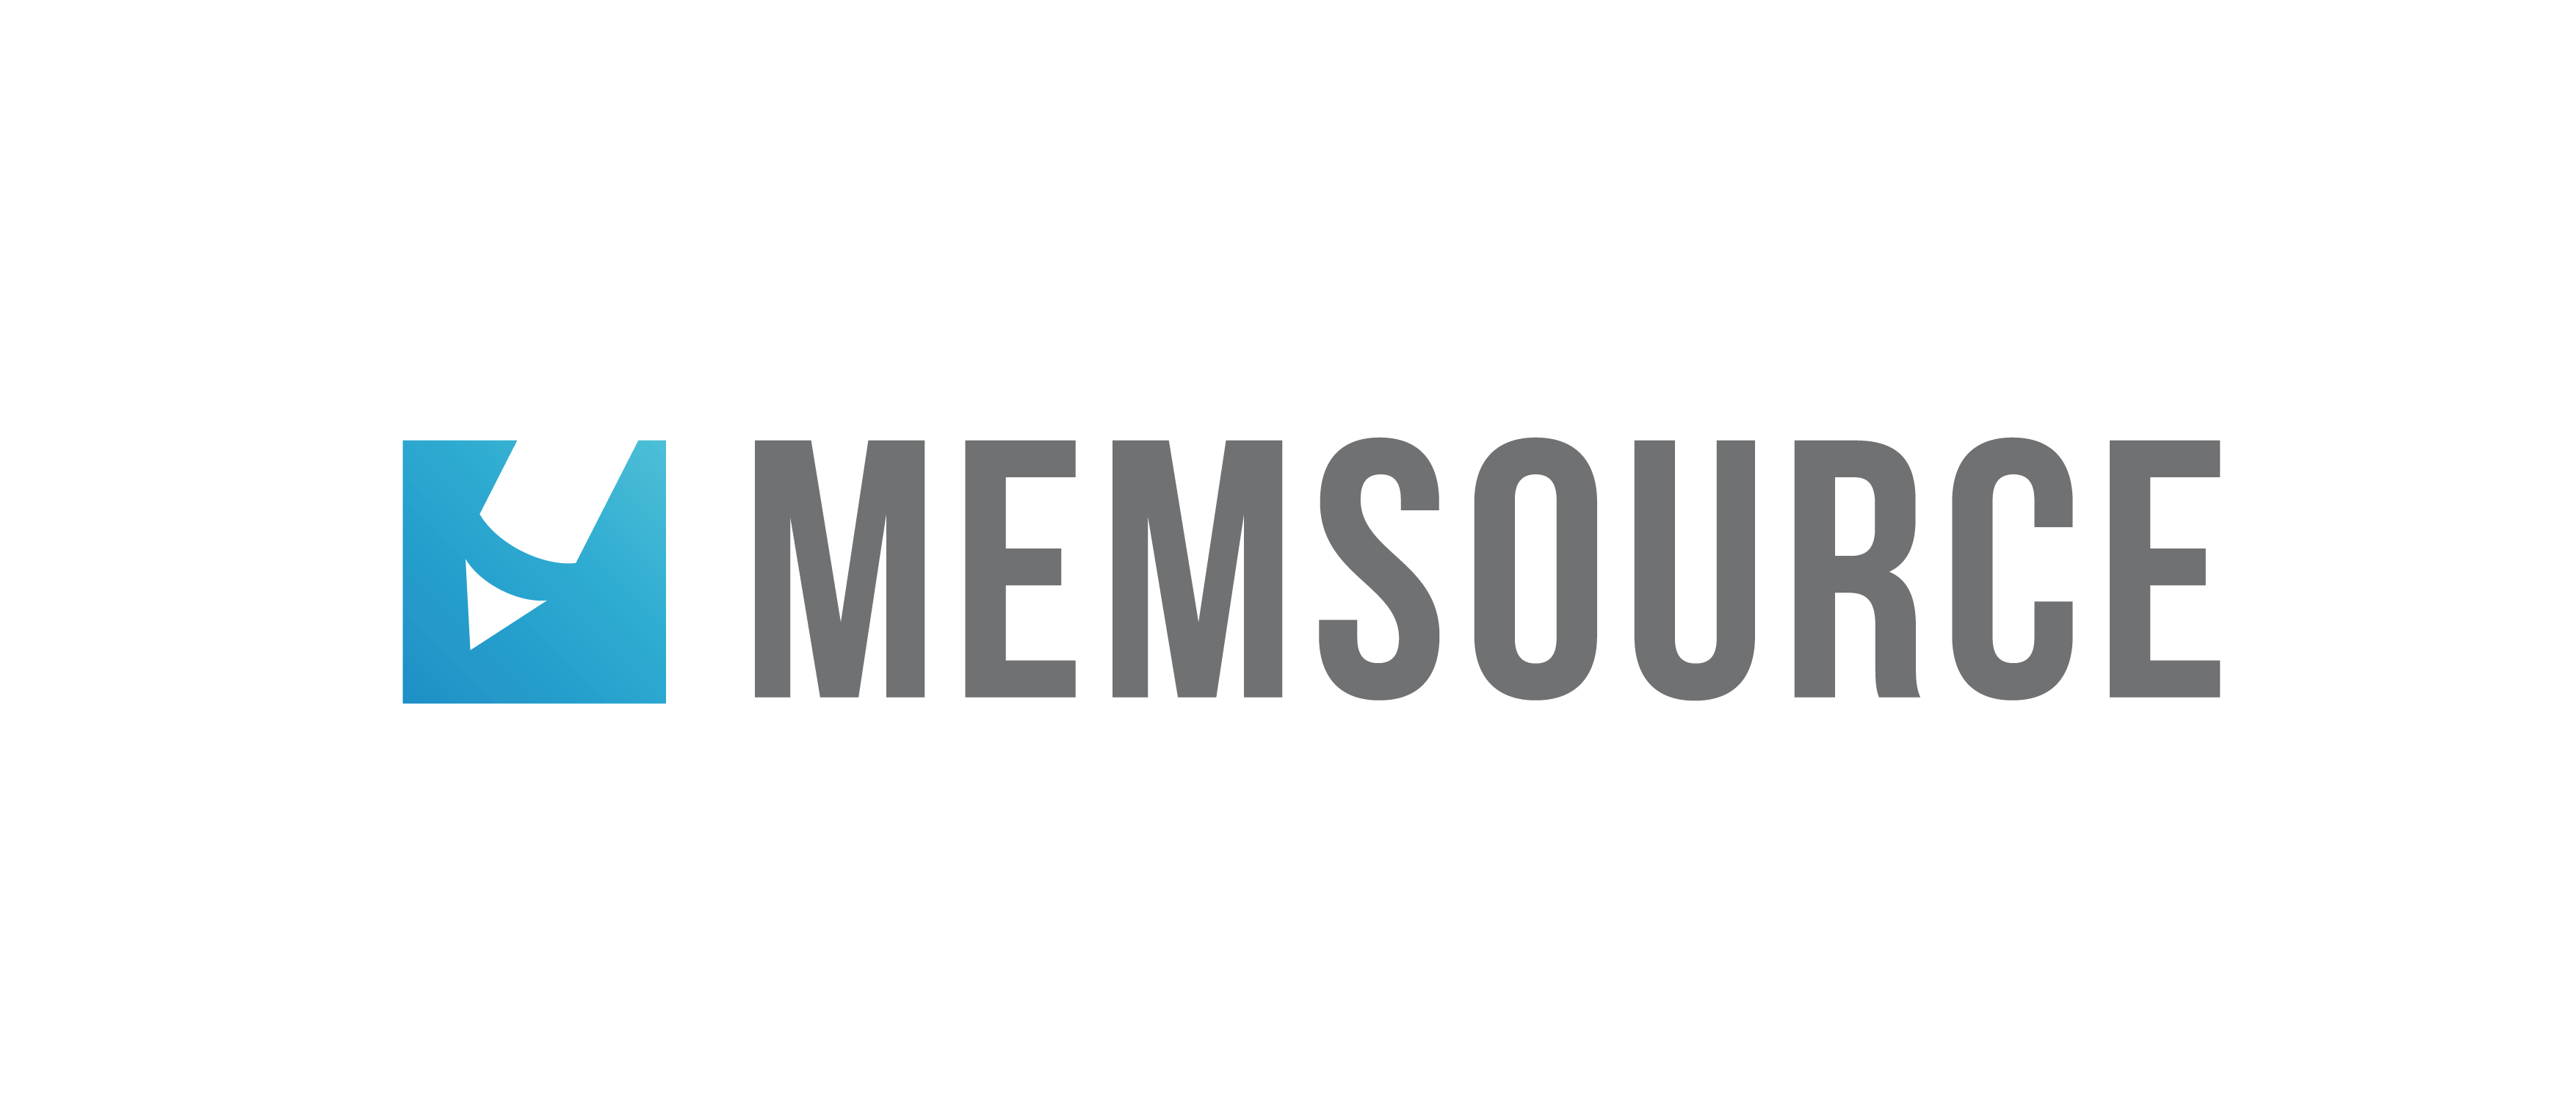 Memsource